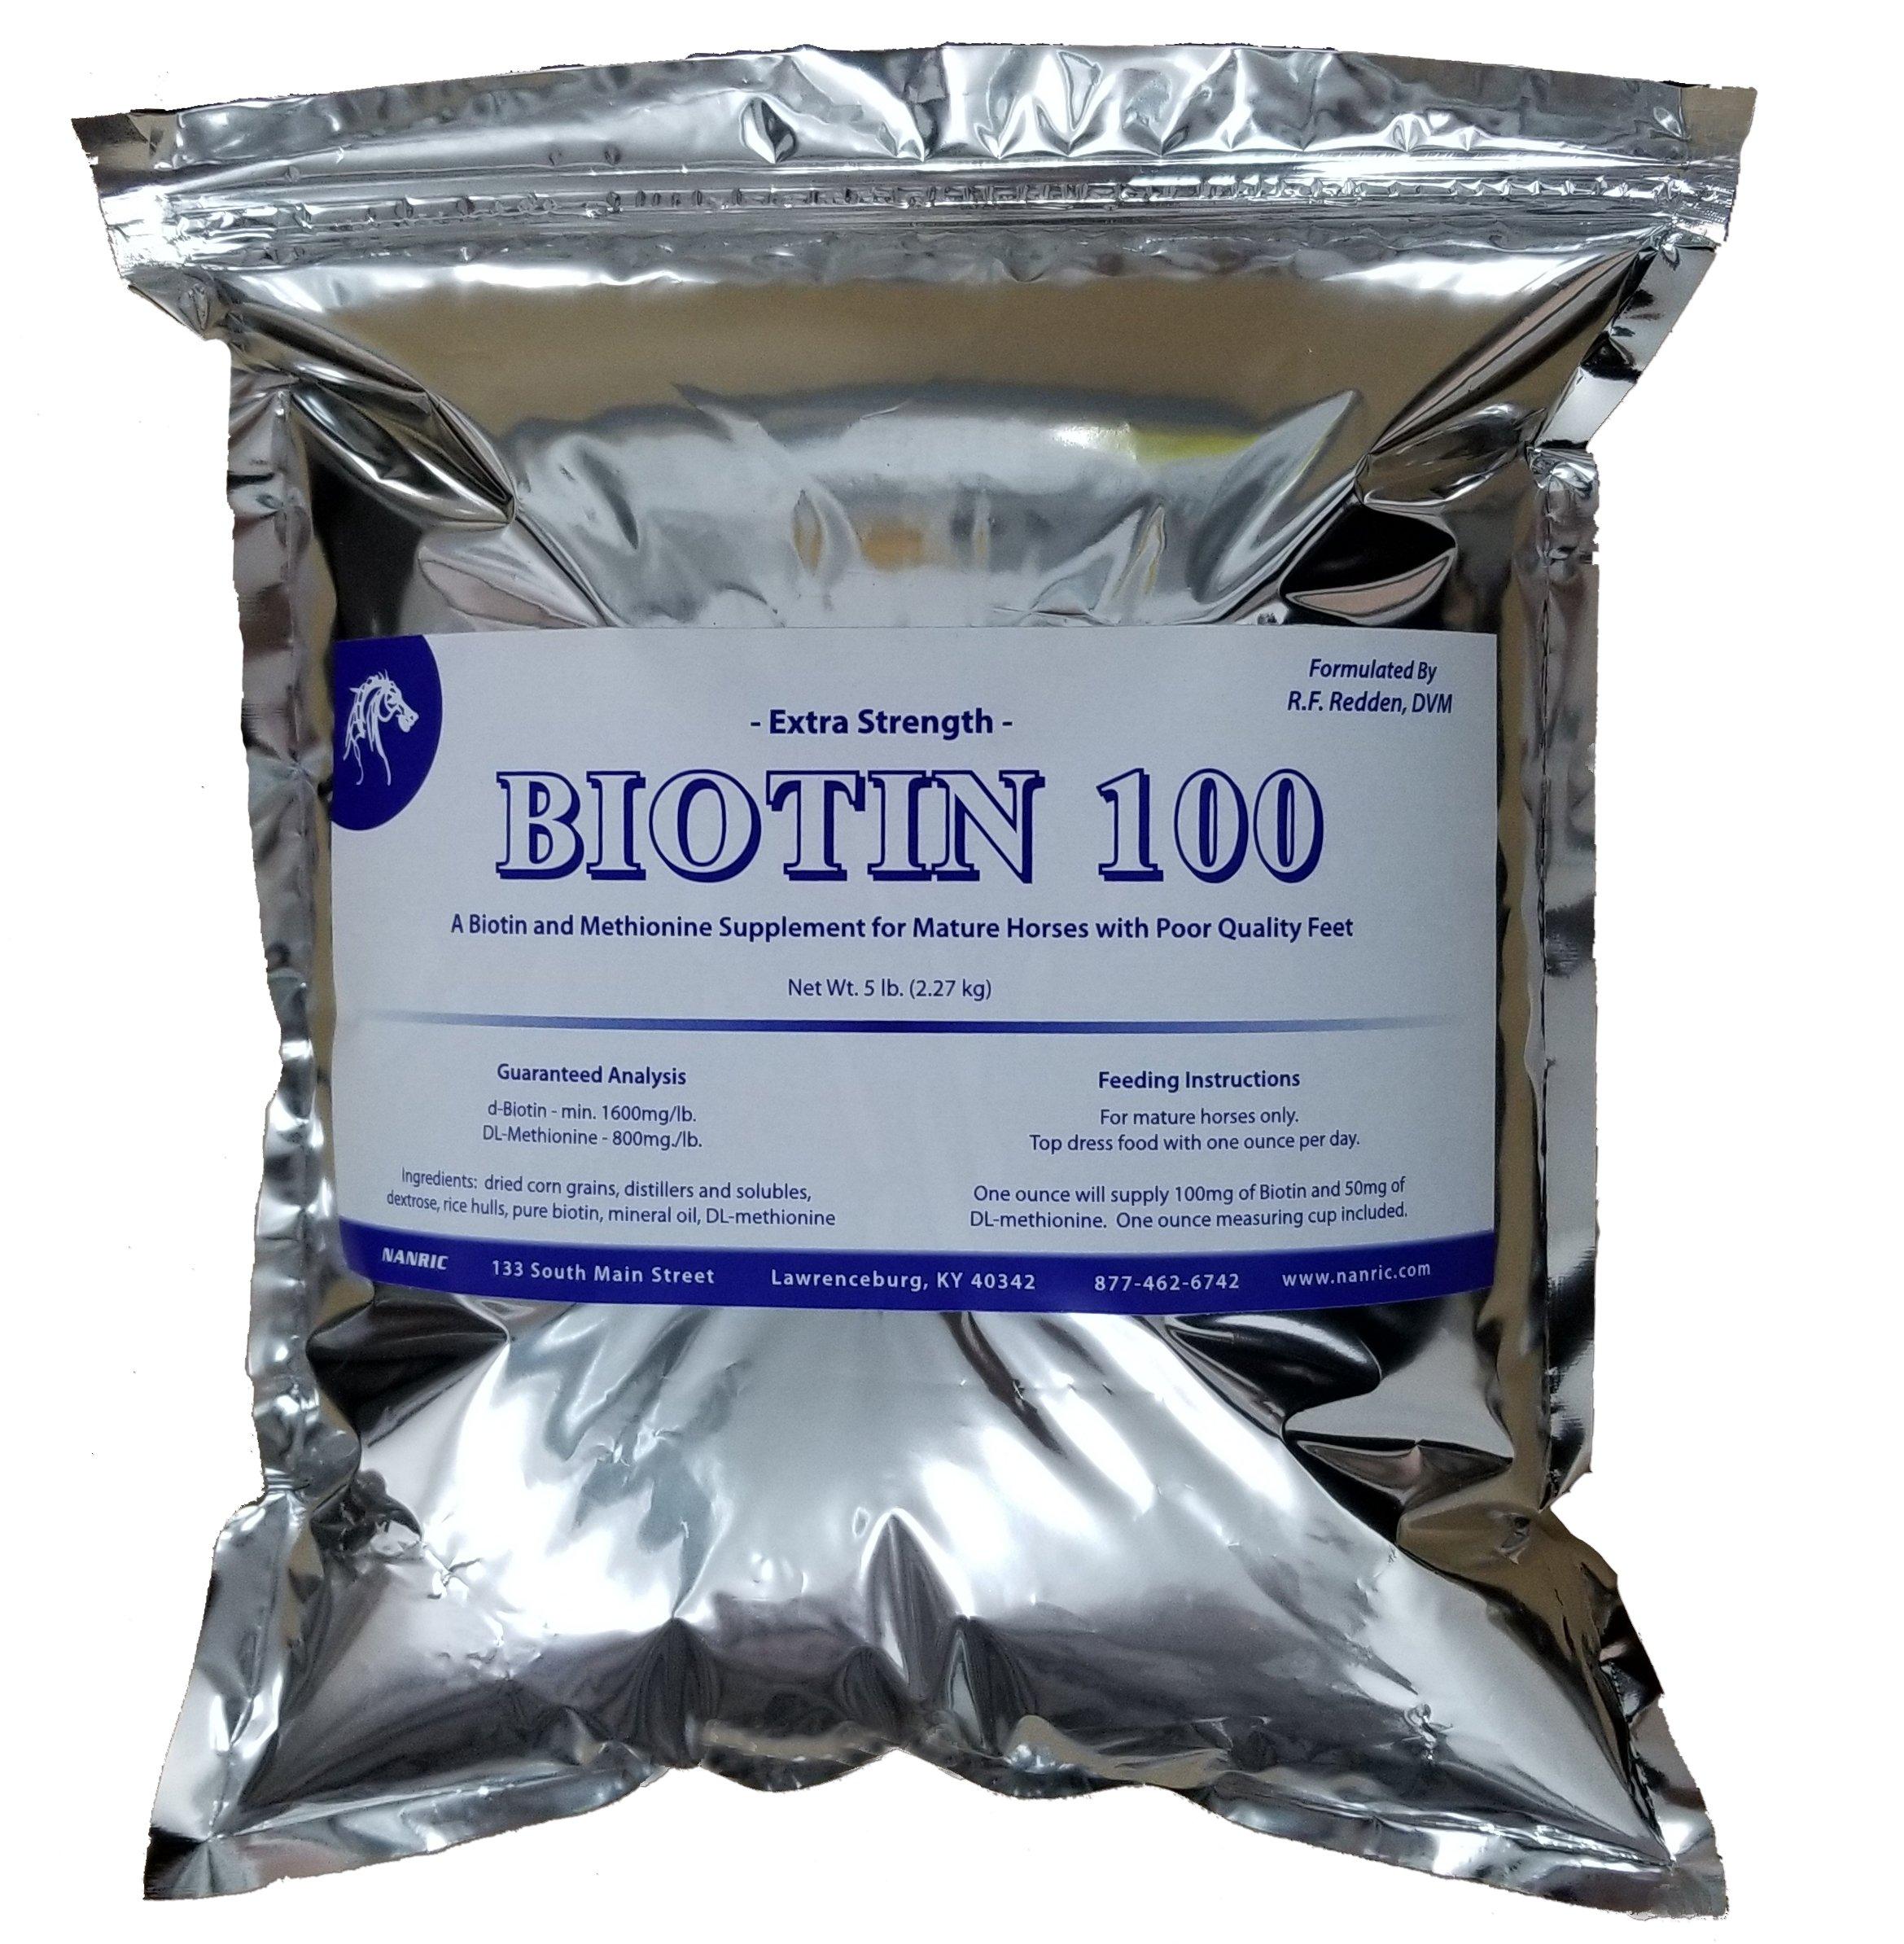 NANRIC BIOTIN100 Bag ONLY